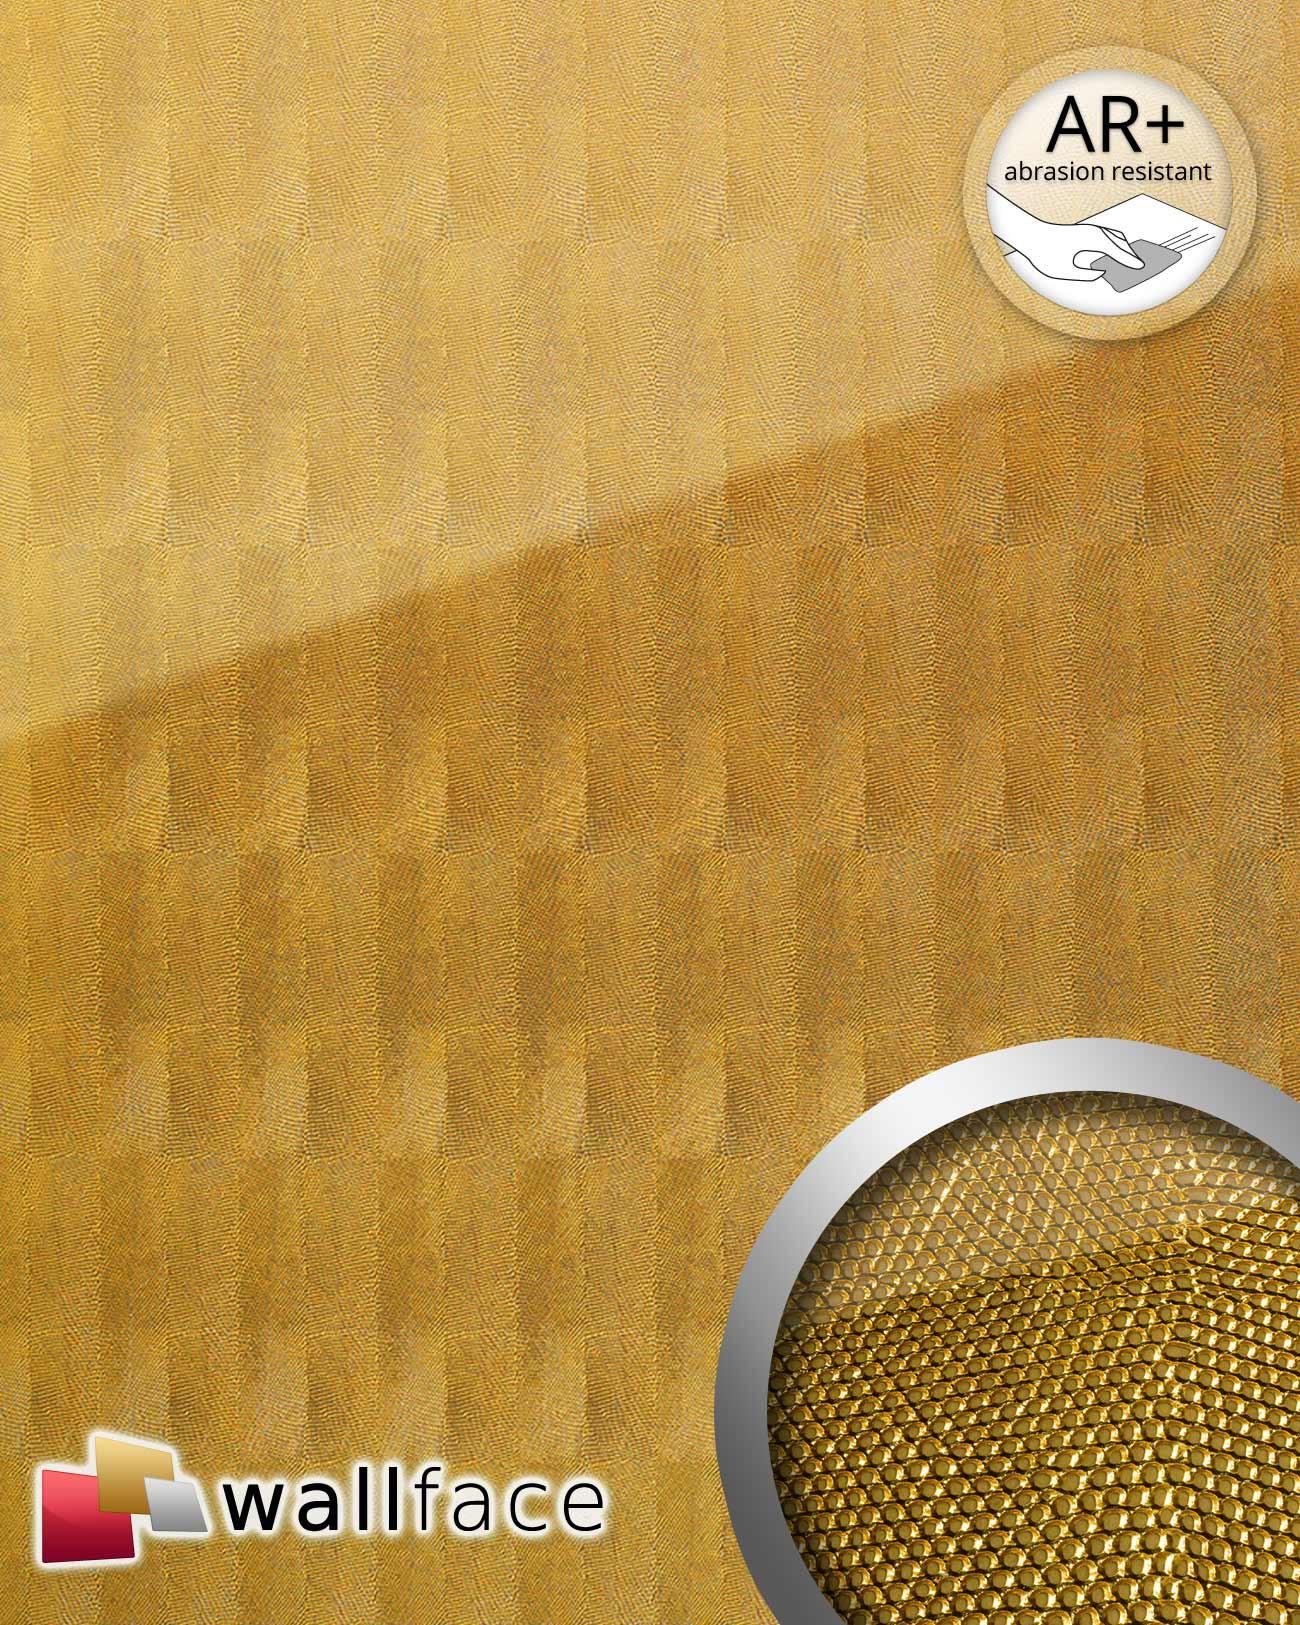 Panou Decorativ S-glass 17014-ar  Wallface  Autoco